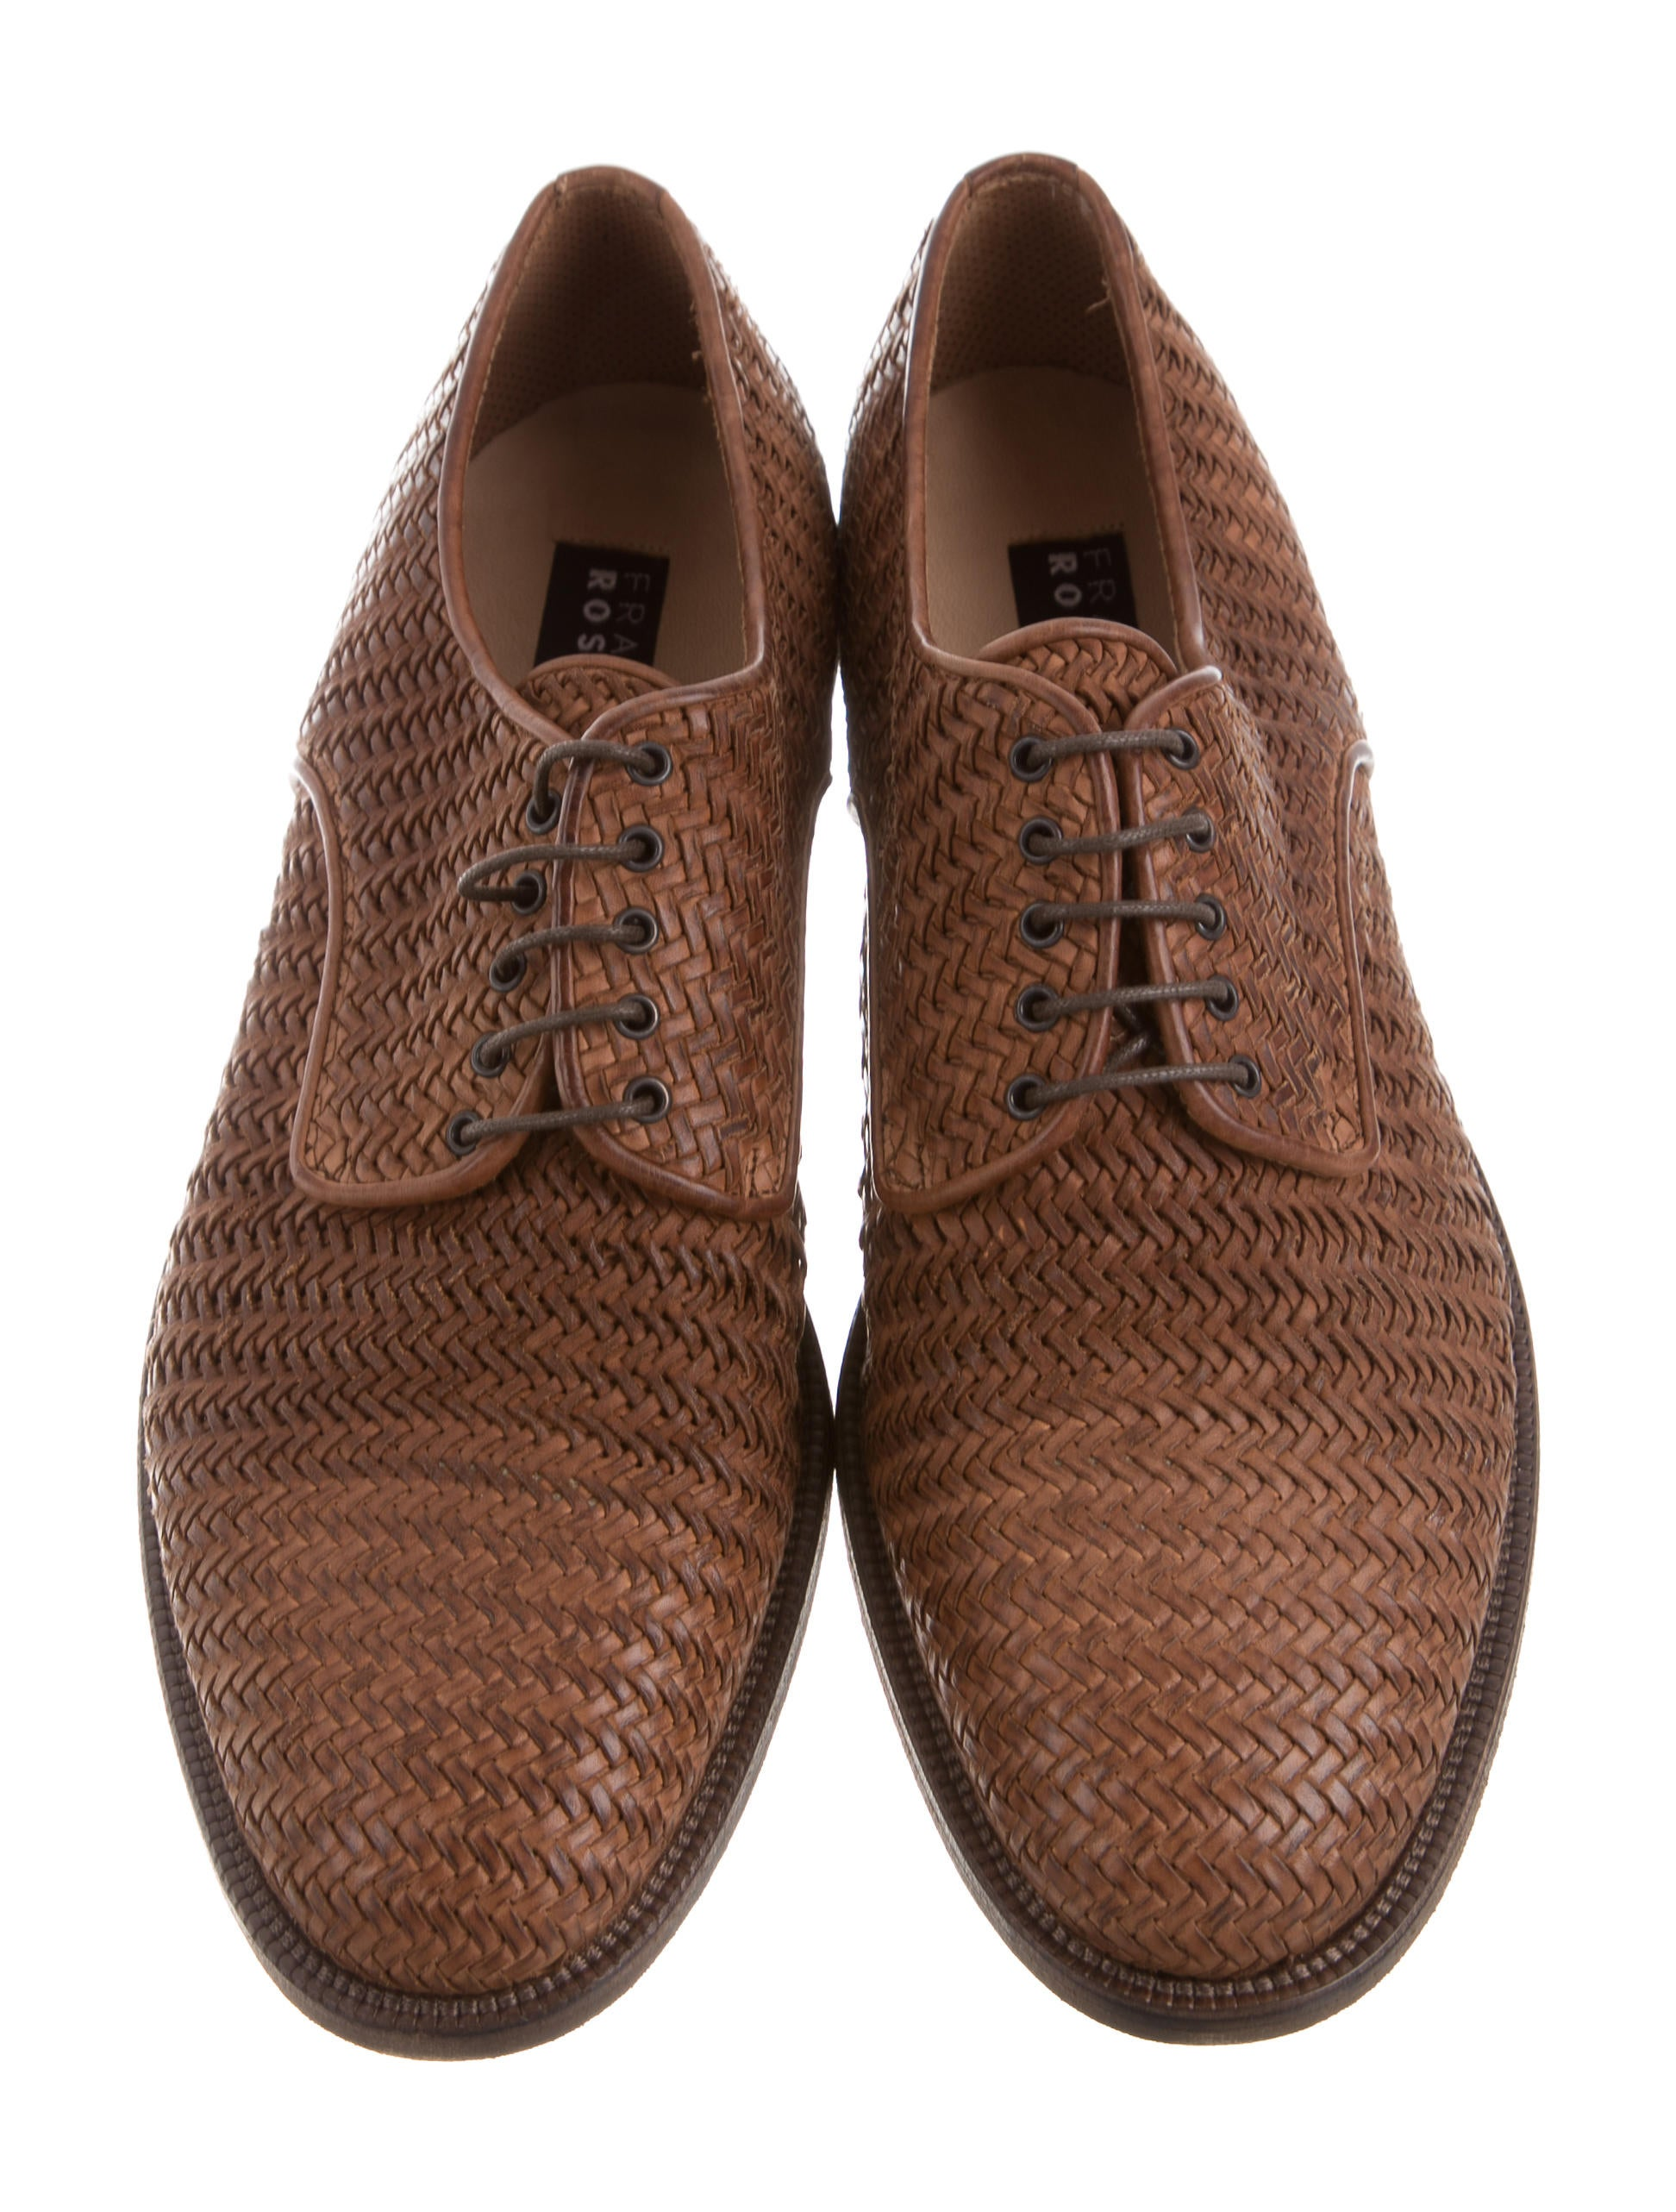 W derby shoes